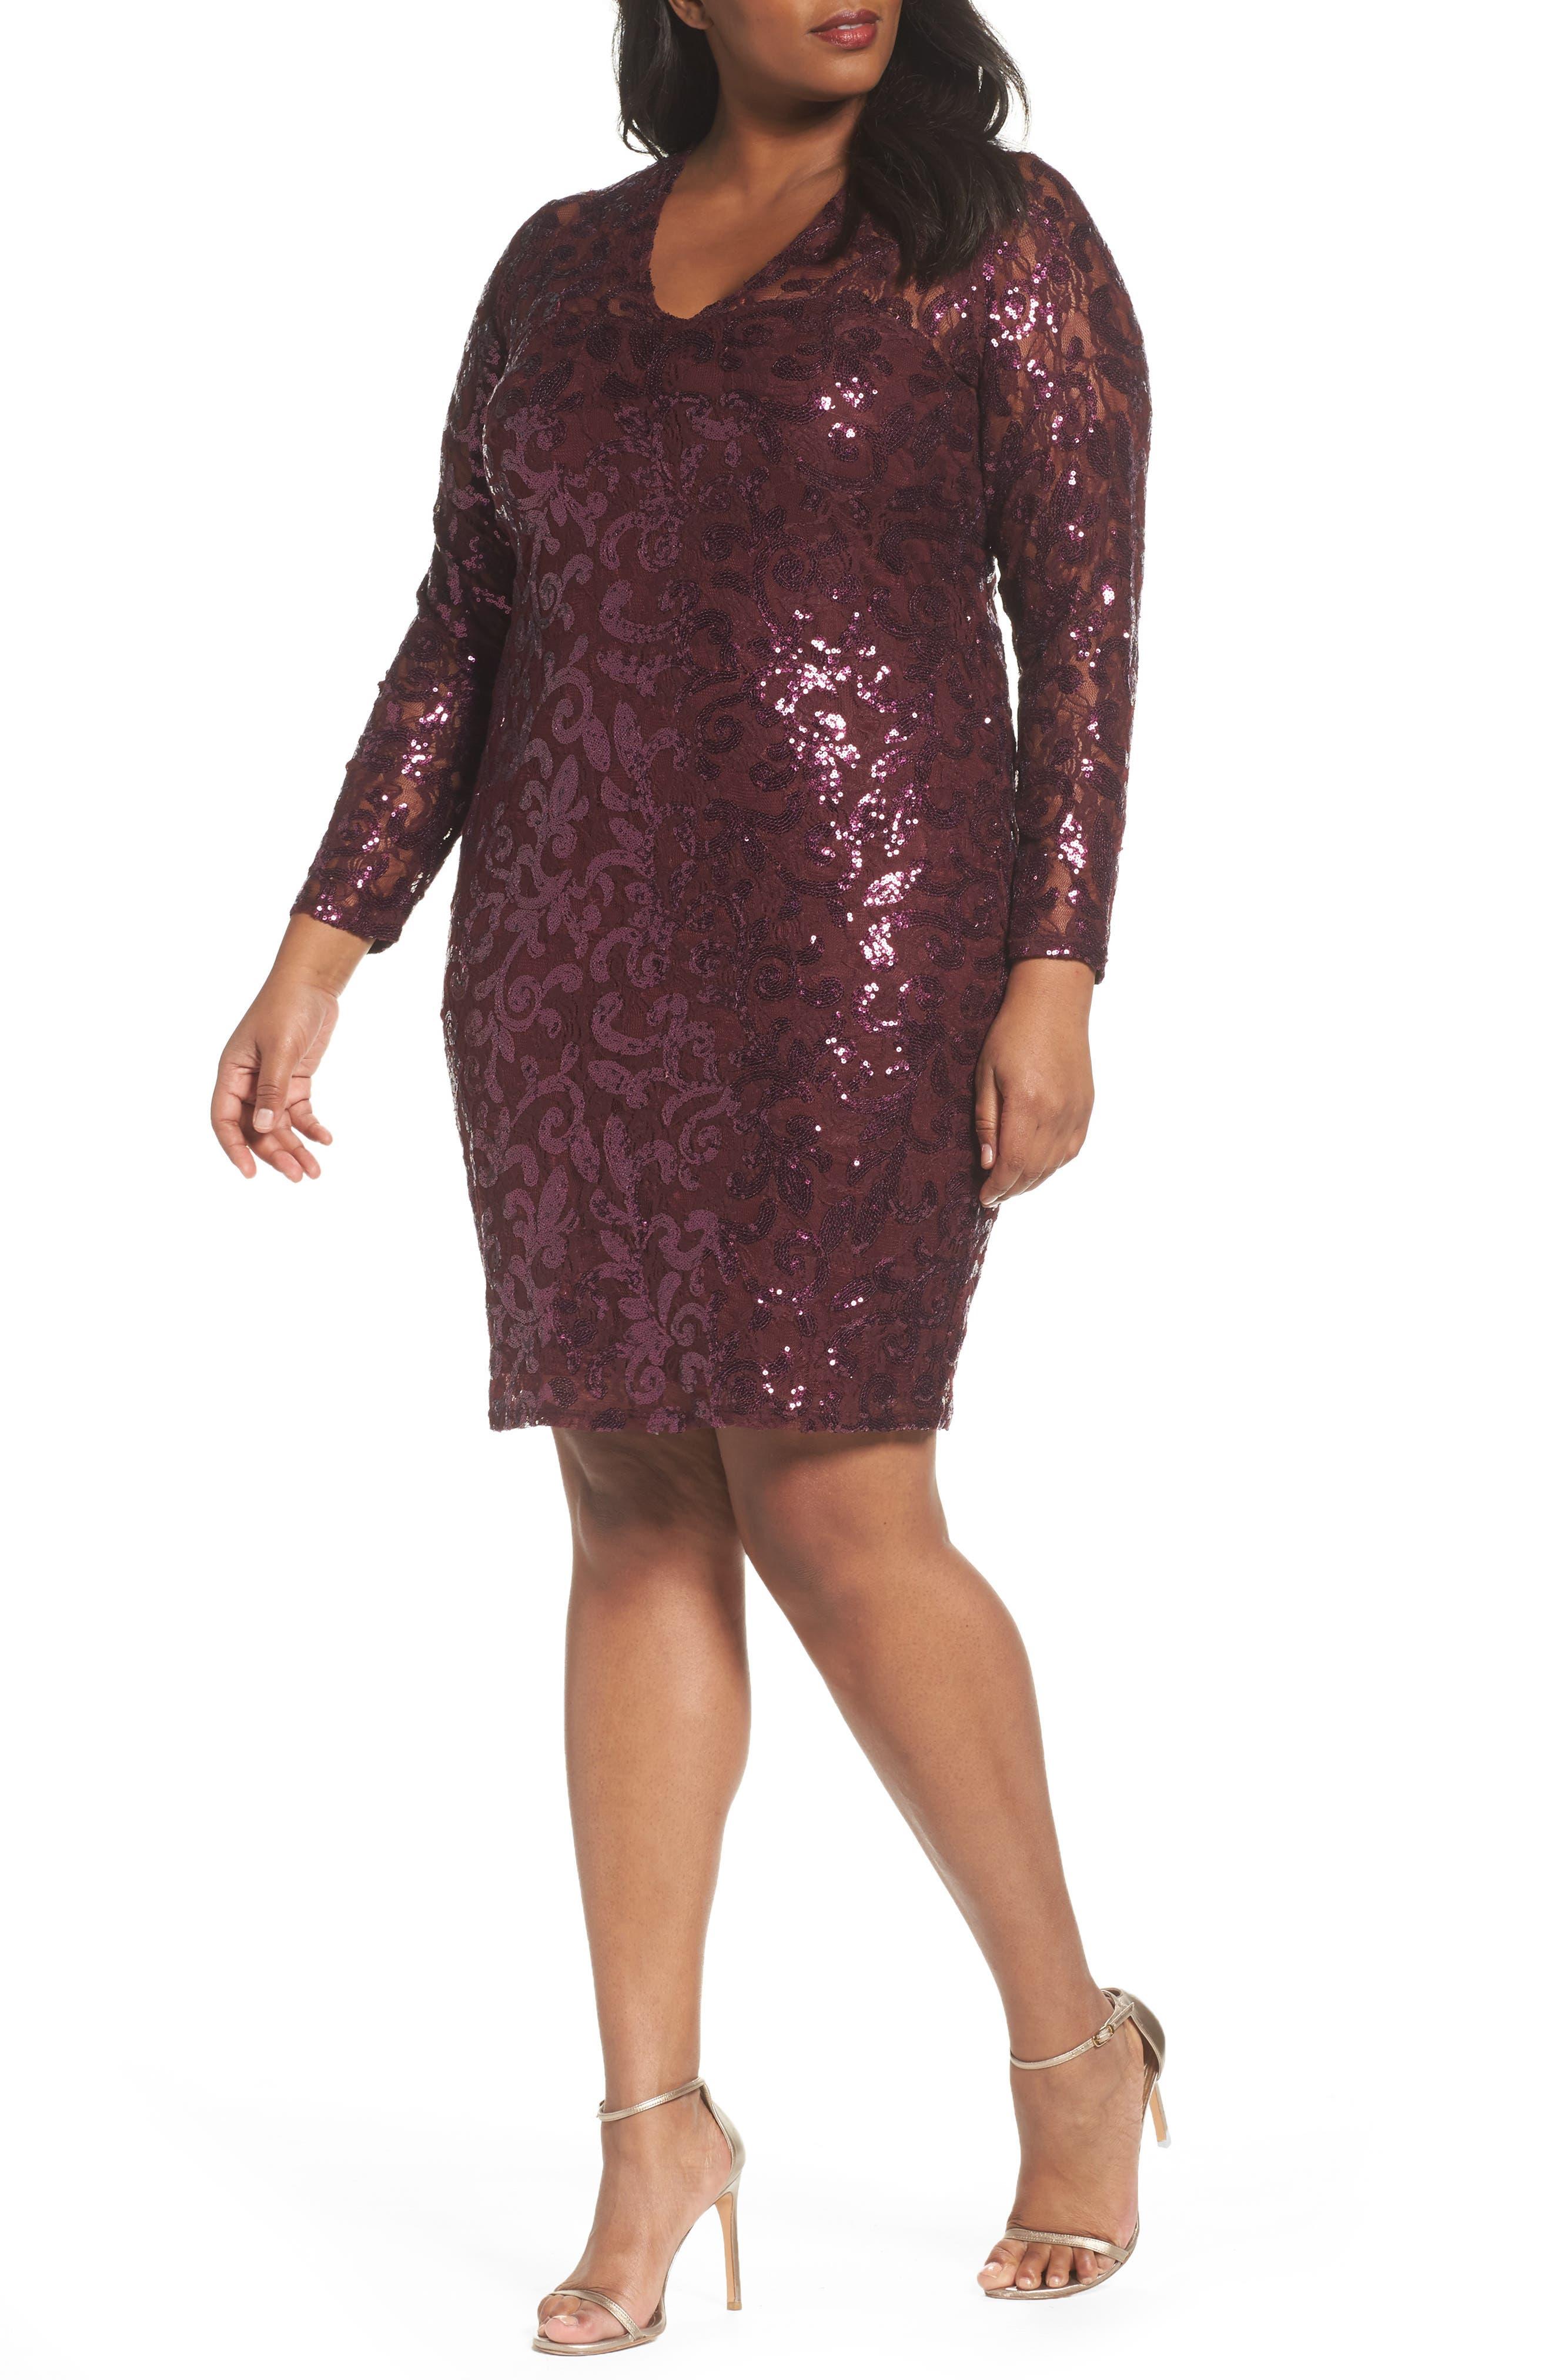 Main Image - Marina Sequin Lace Stretch Sheath Dress (Plus Size)